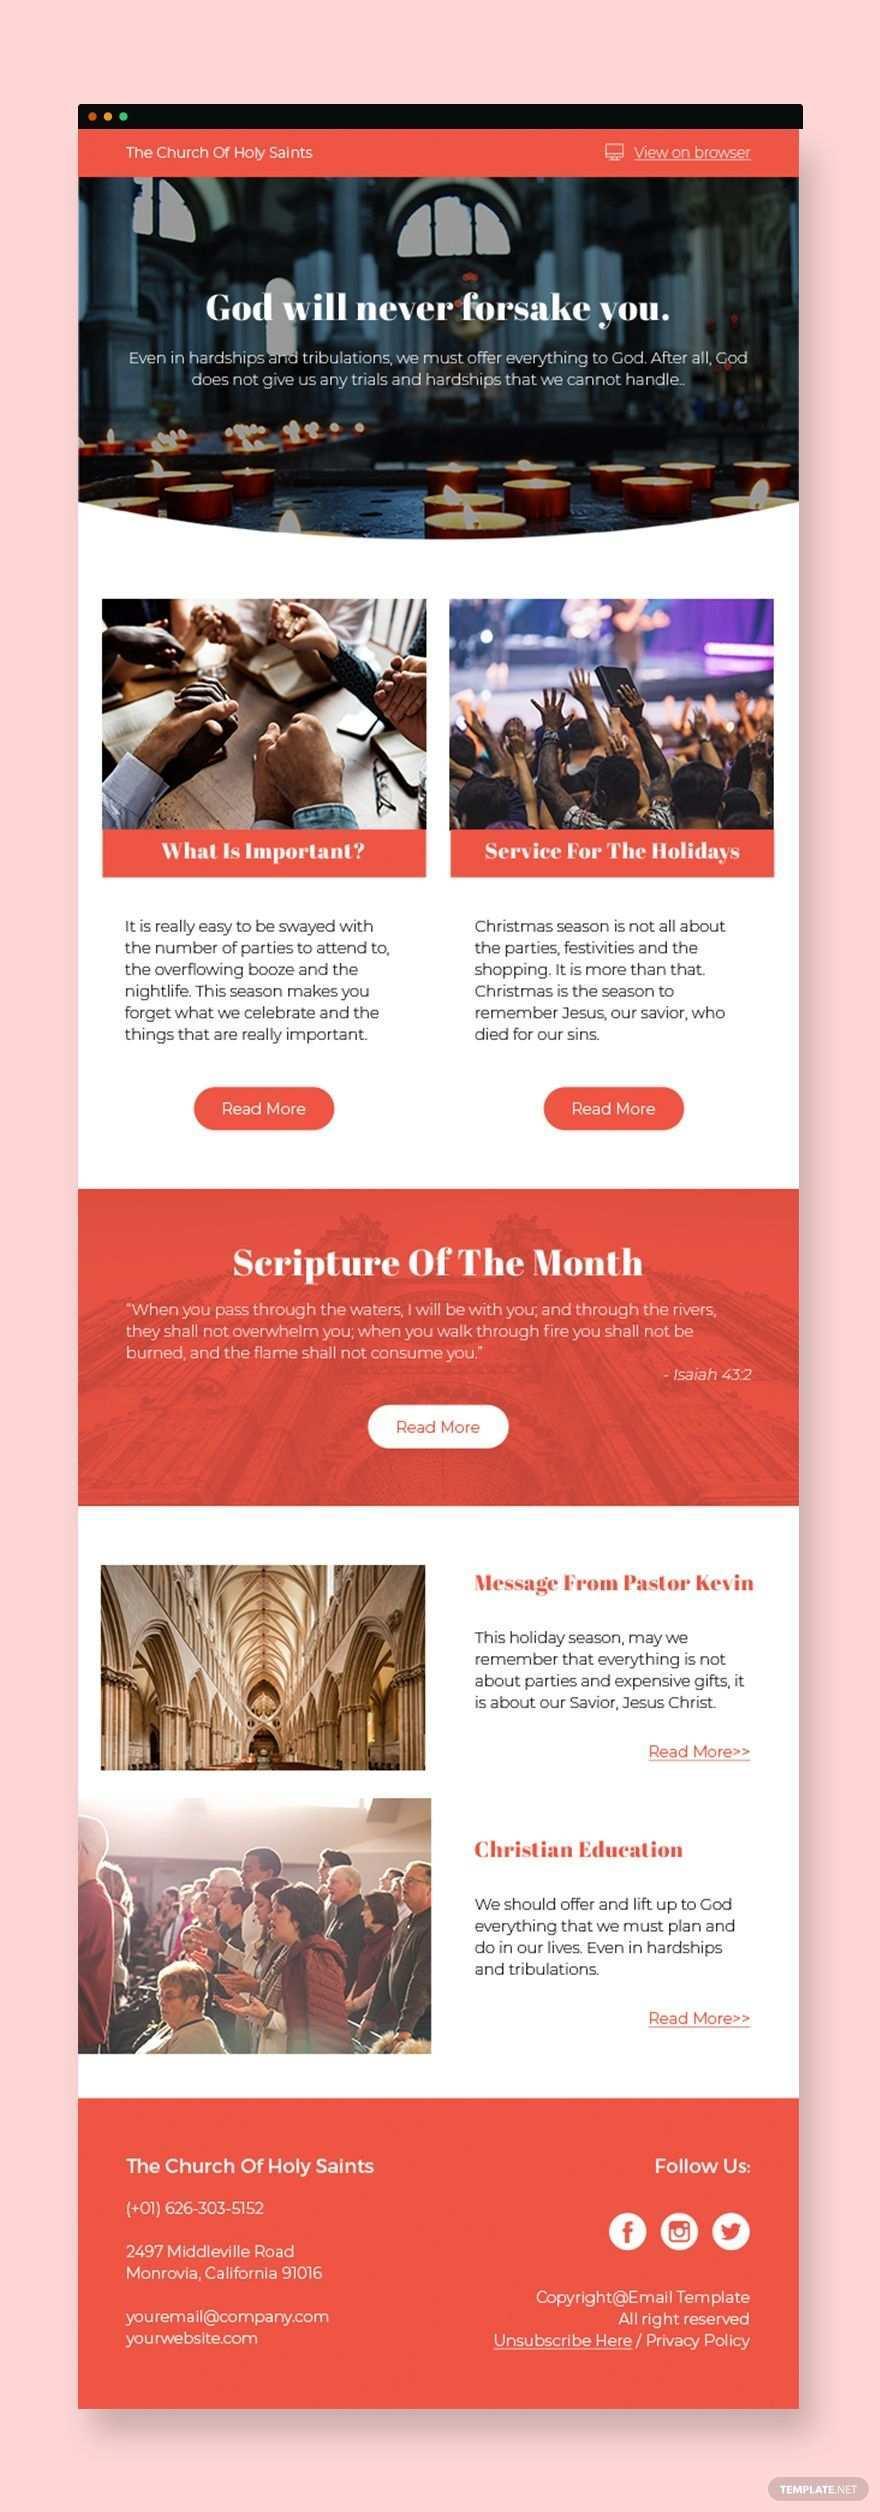 Church Newsletter Template In 2020 Church Newsletter Newsletter Templates Church